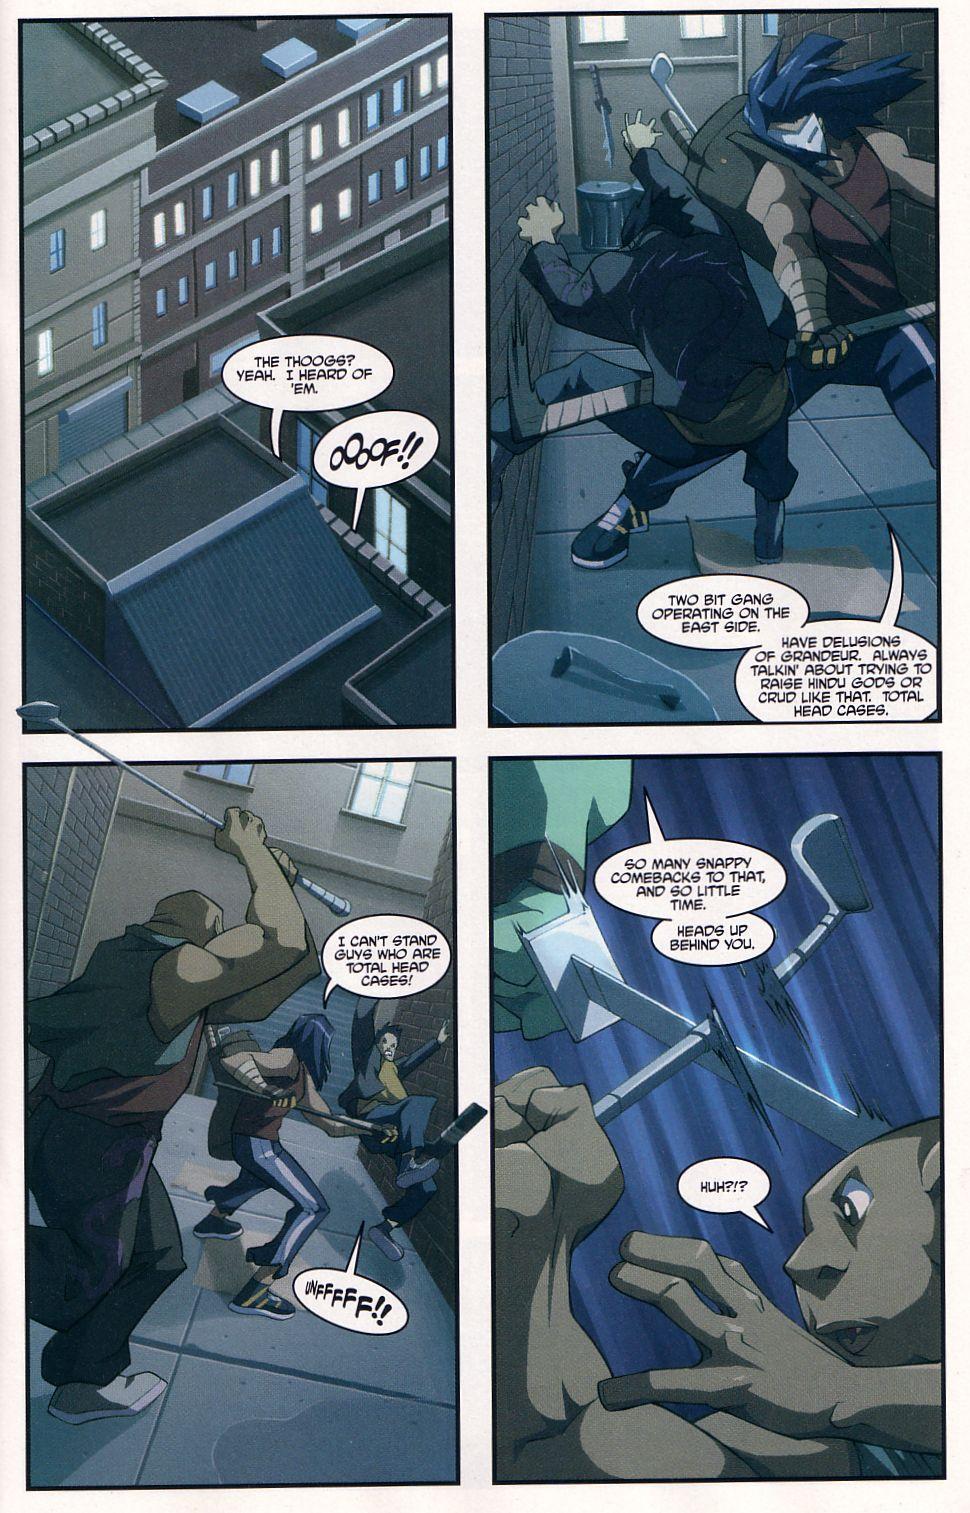 Teenage Mutant Ninja Turtles (2003) chap 7 pic 5